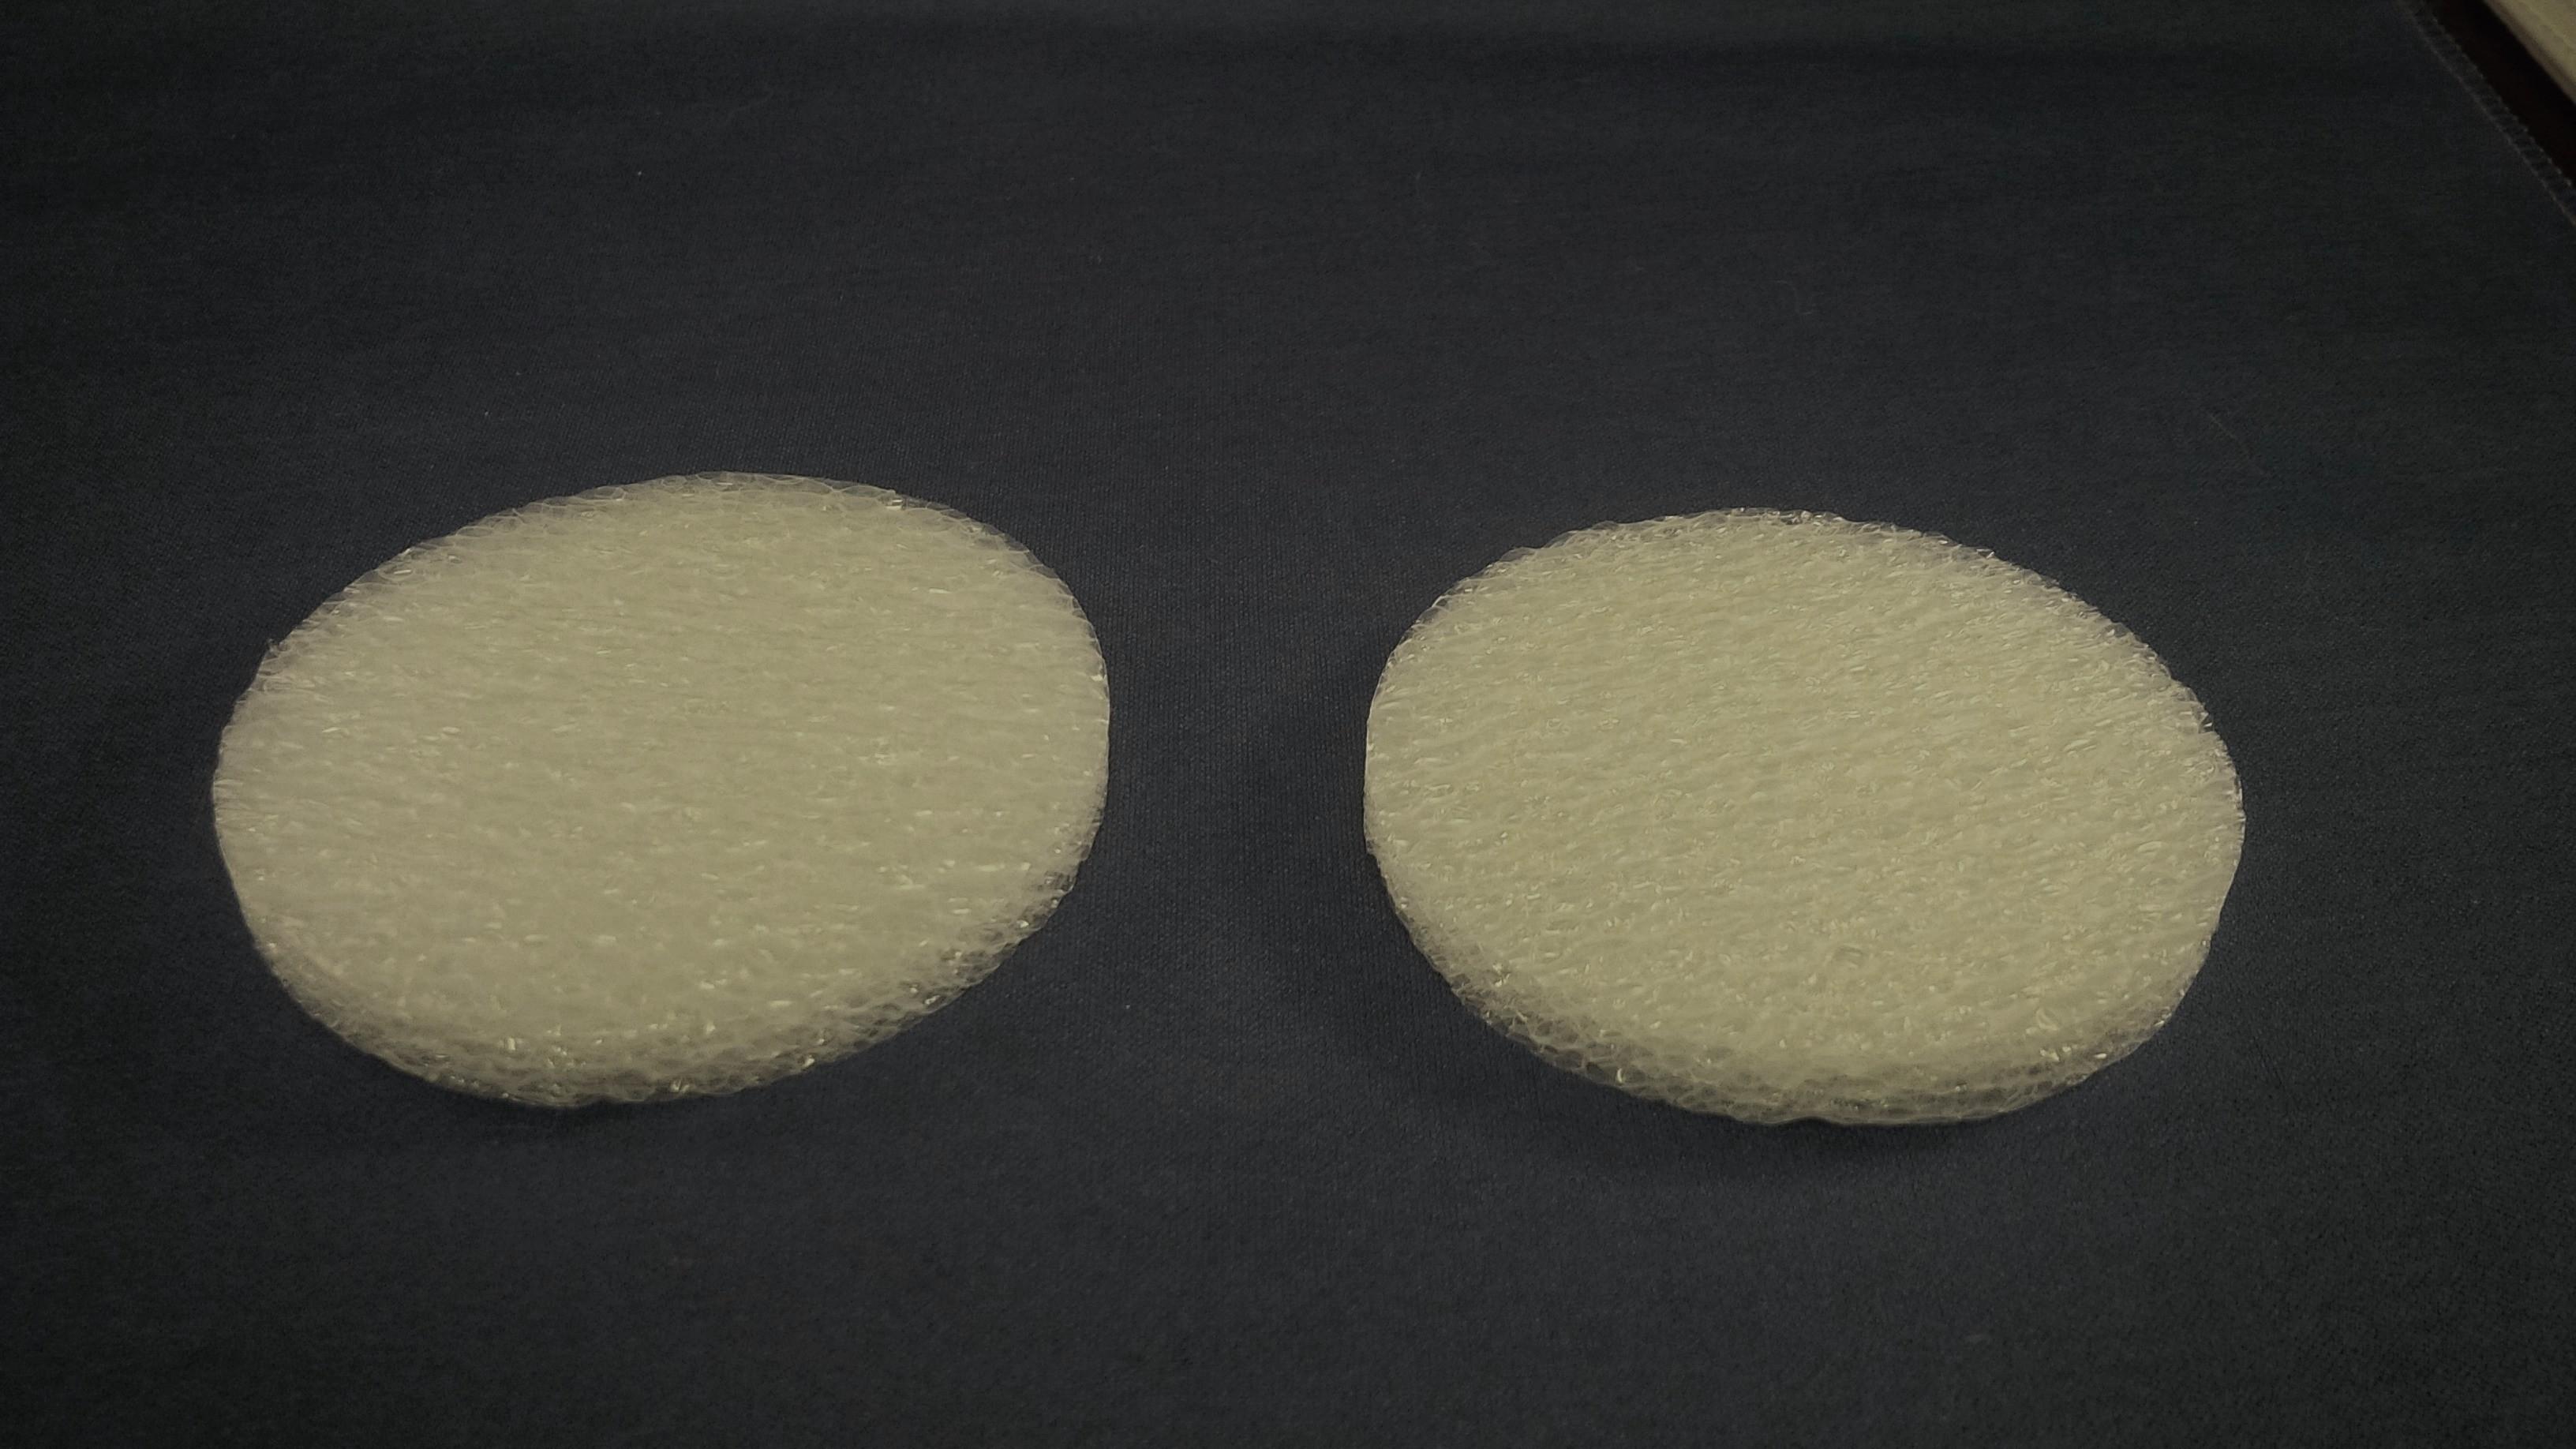 Pair of 85mm inserts for Quark container (QCONTAINER)